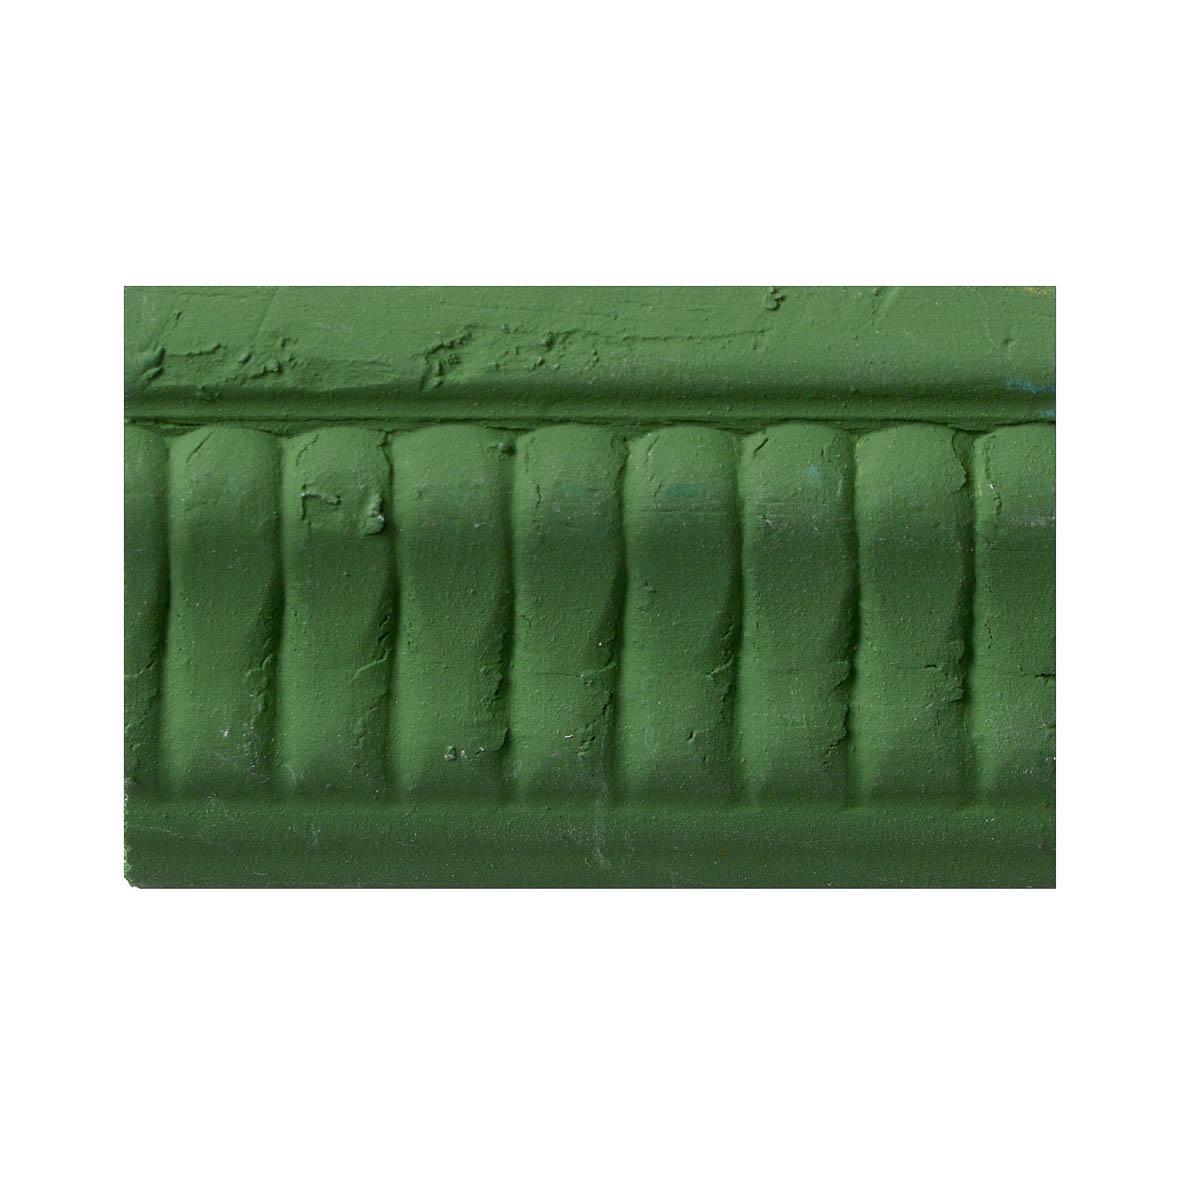 Waverly ® Inspirations Chalk Acrylic Paint - Fern, 8 oz.